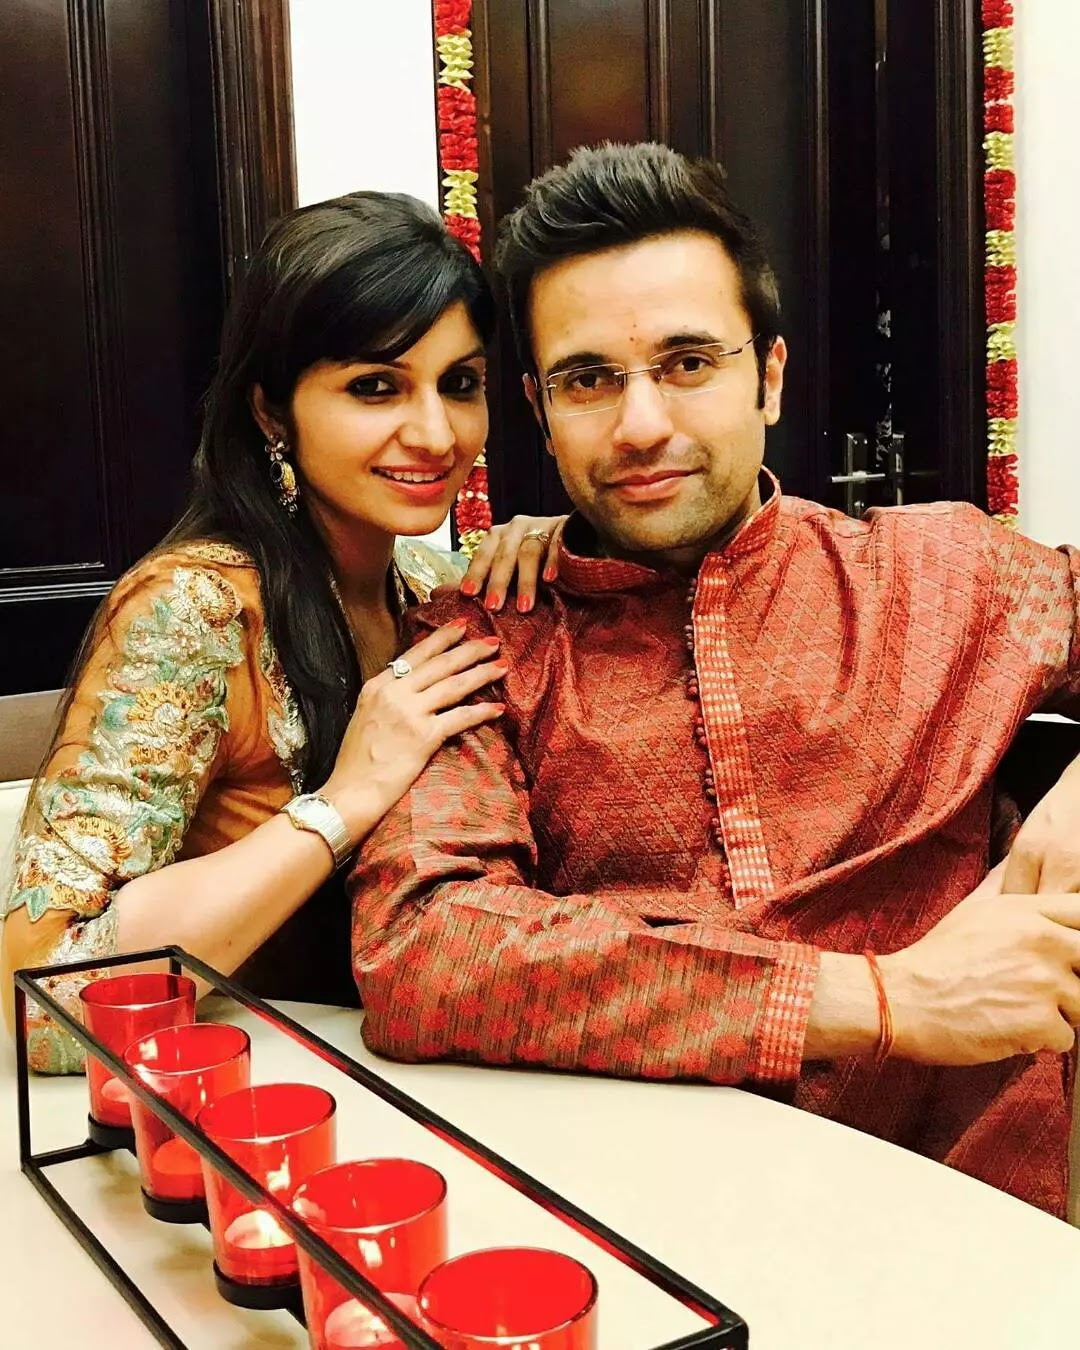 Sandeep Maheshwari with neha